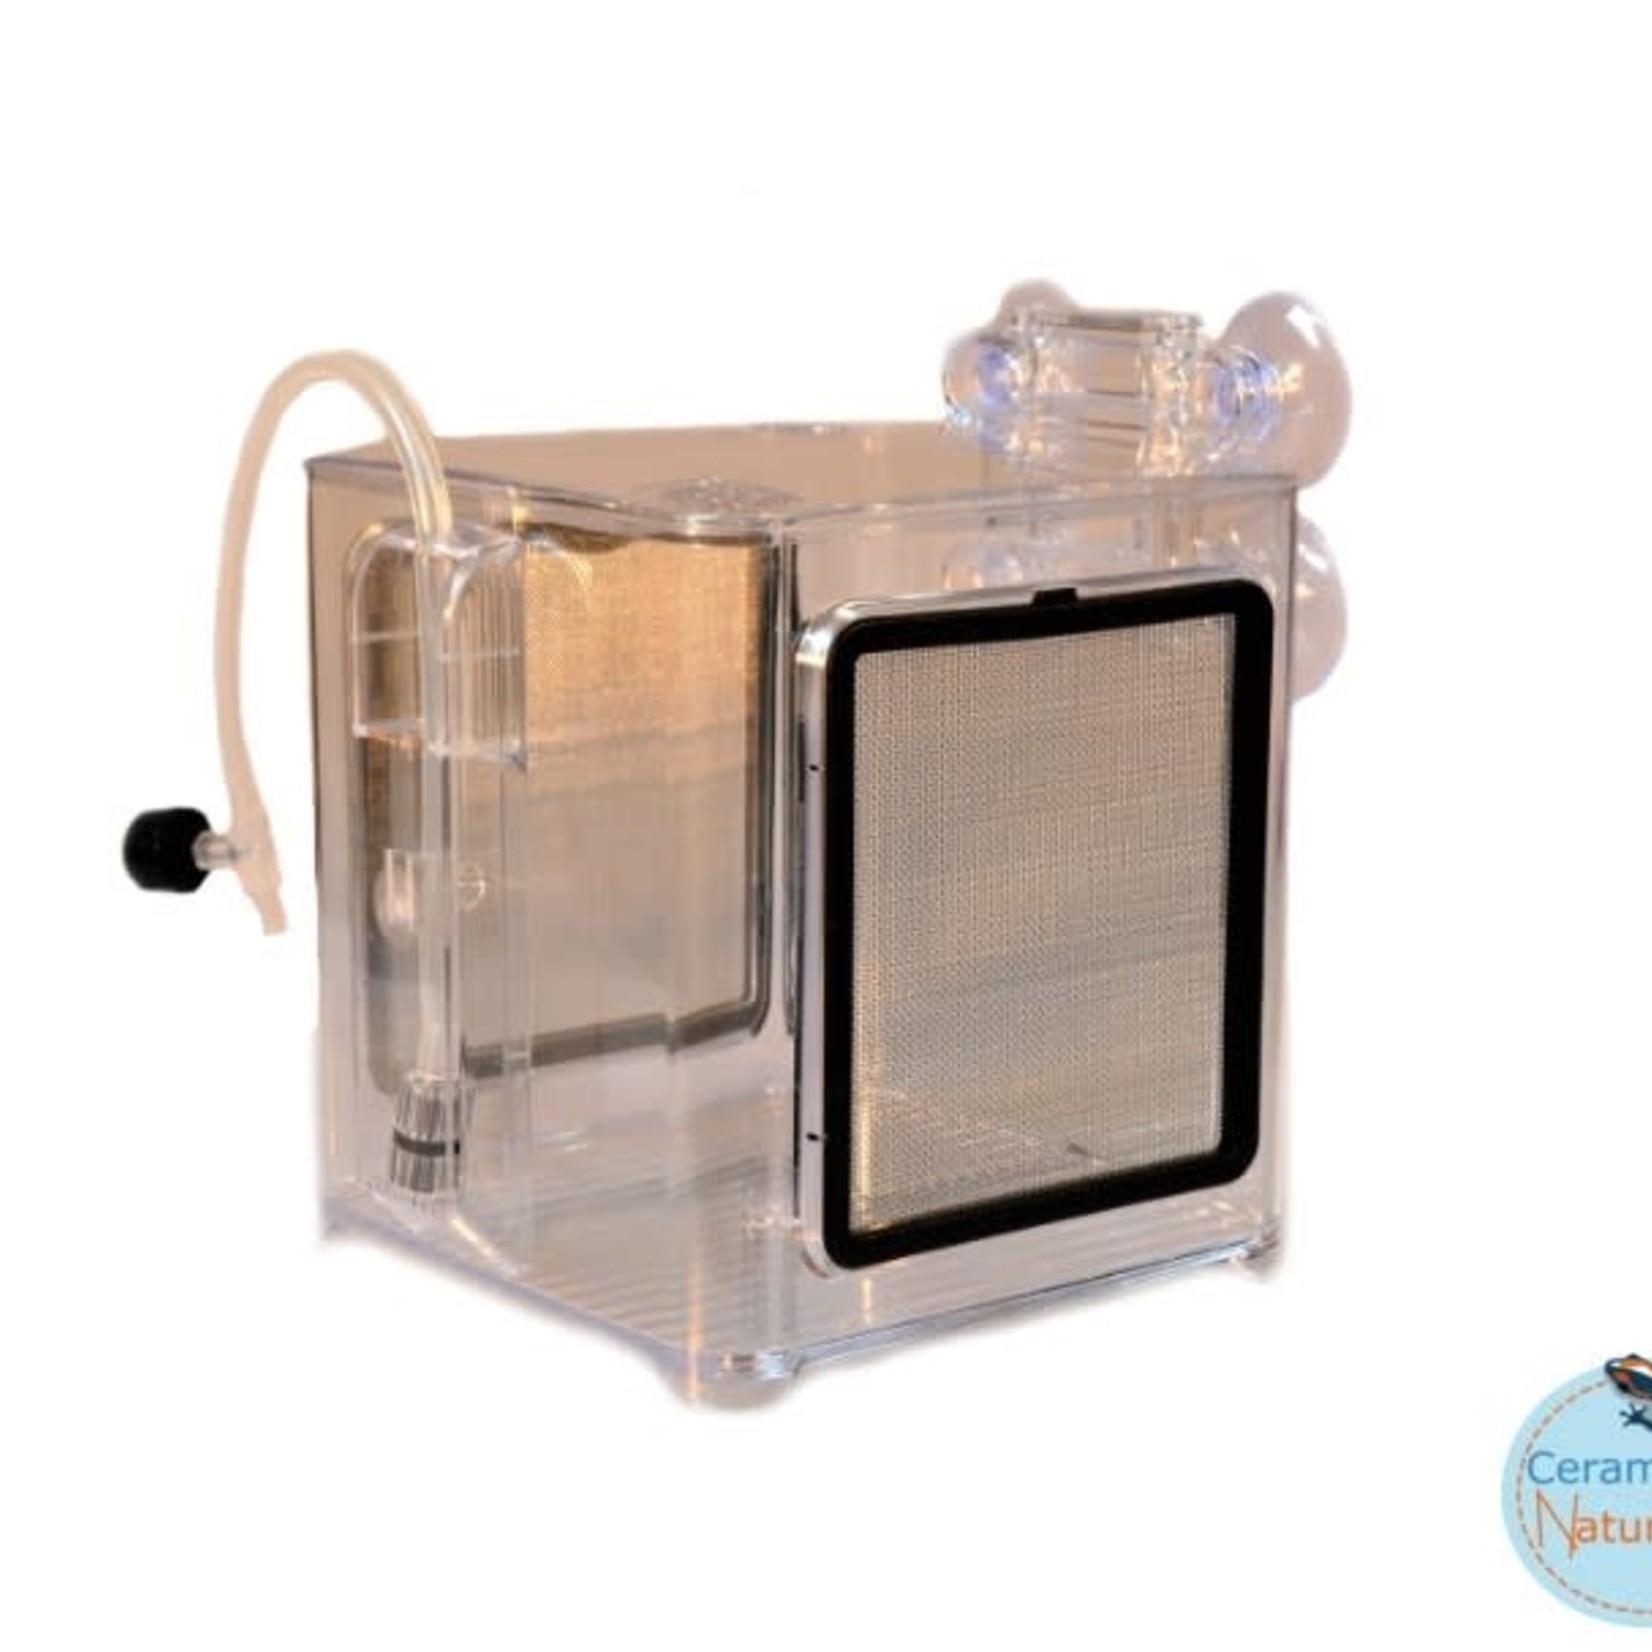 Ziss Breeding box BL-2 - Perfect for breeding fish and shrimp